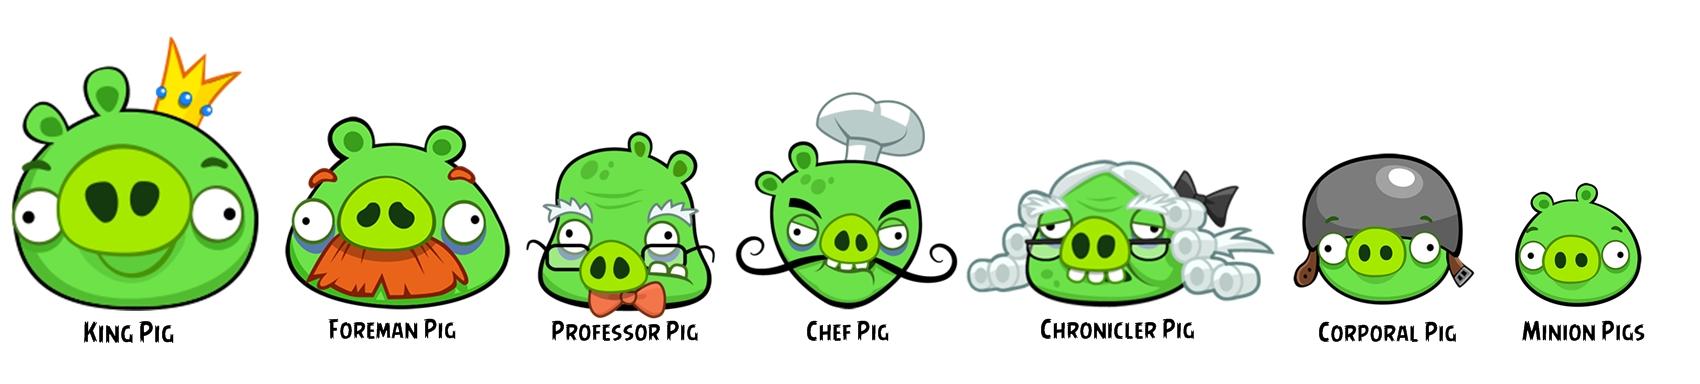 Bad Piggies - Angry Birds Wiki